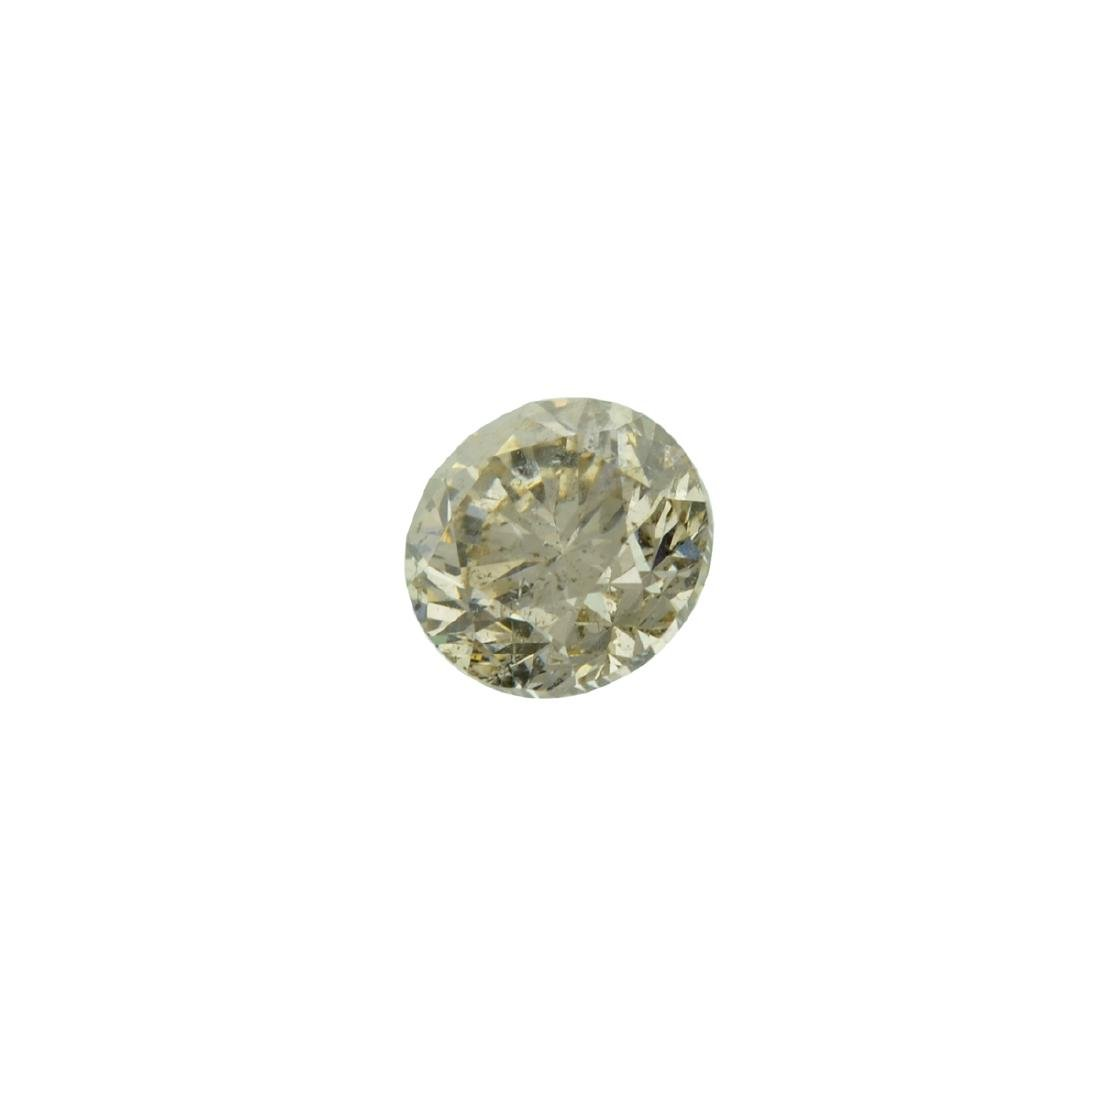 Fine Jewelry GIA Certified 0.81CT Brilliant Round Cut